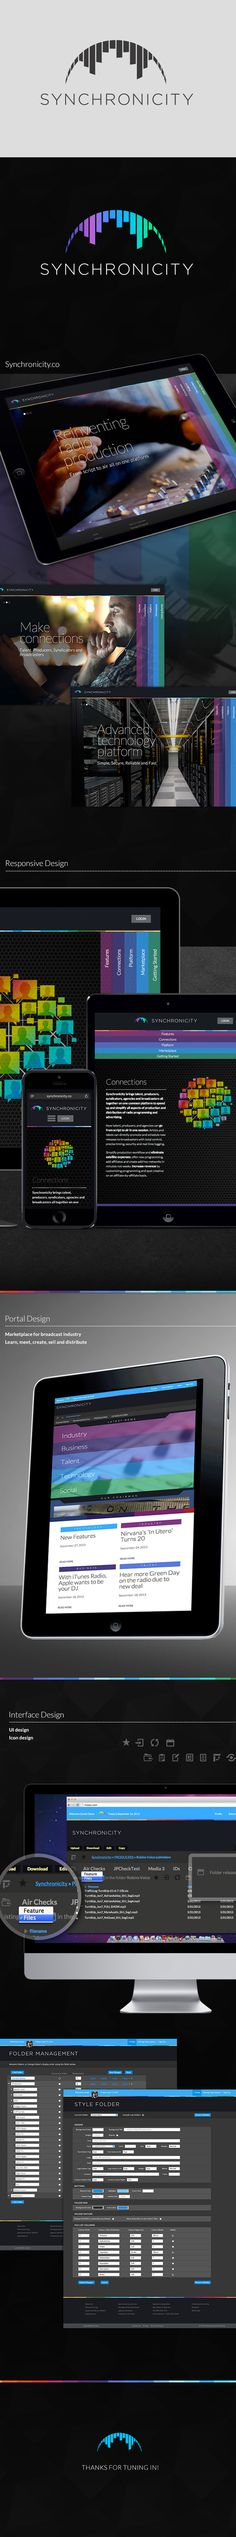 SYNCHRONICITY: Identity & Web Design on Behance